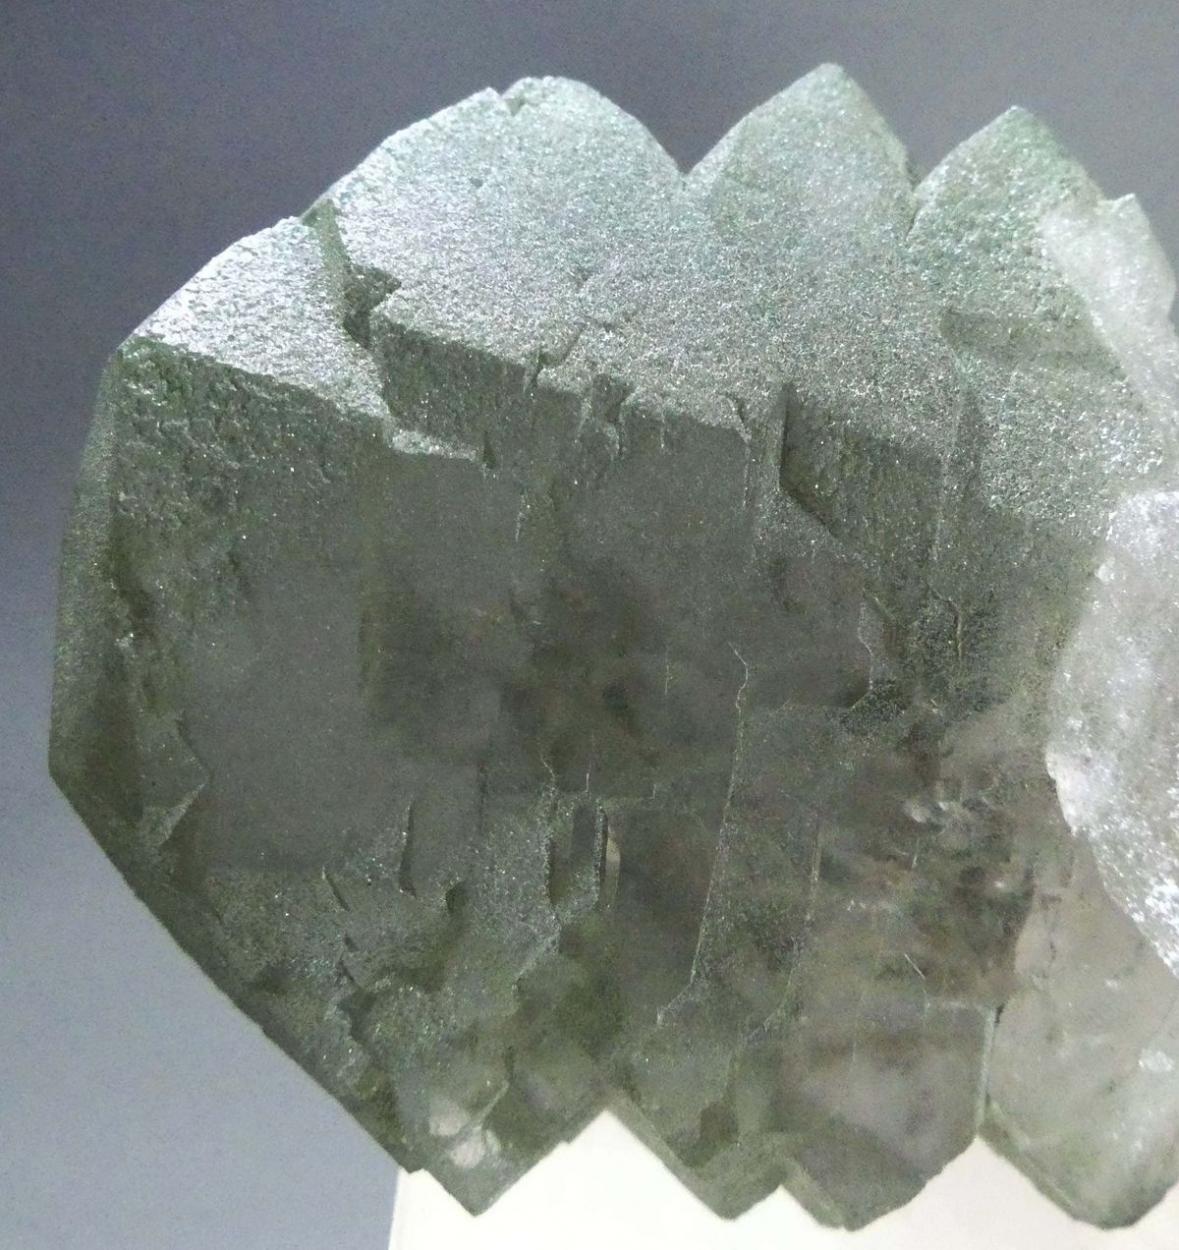 Rock Crystal Var Gwindel With Chlorite